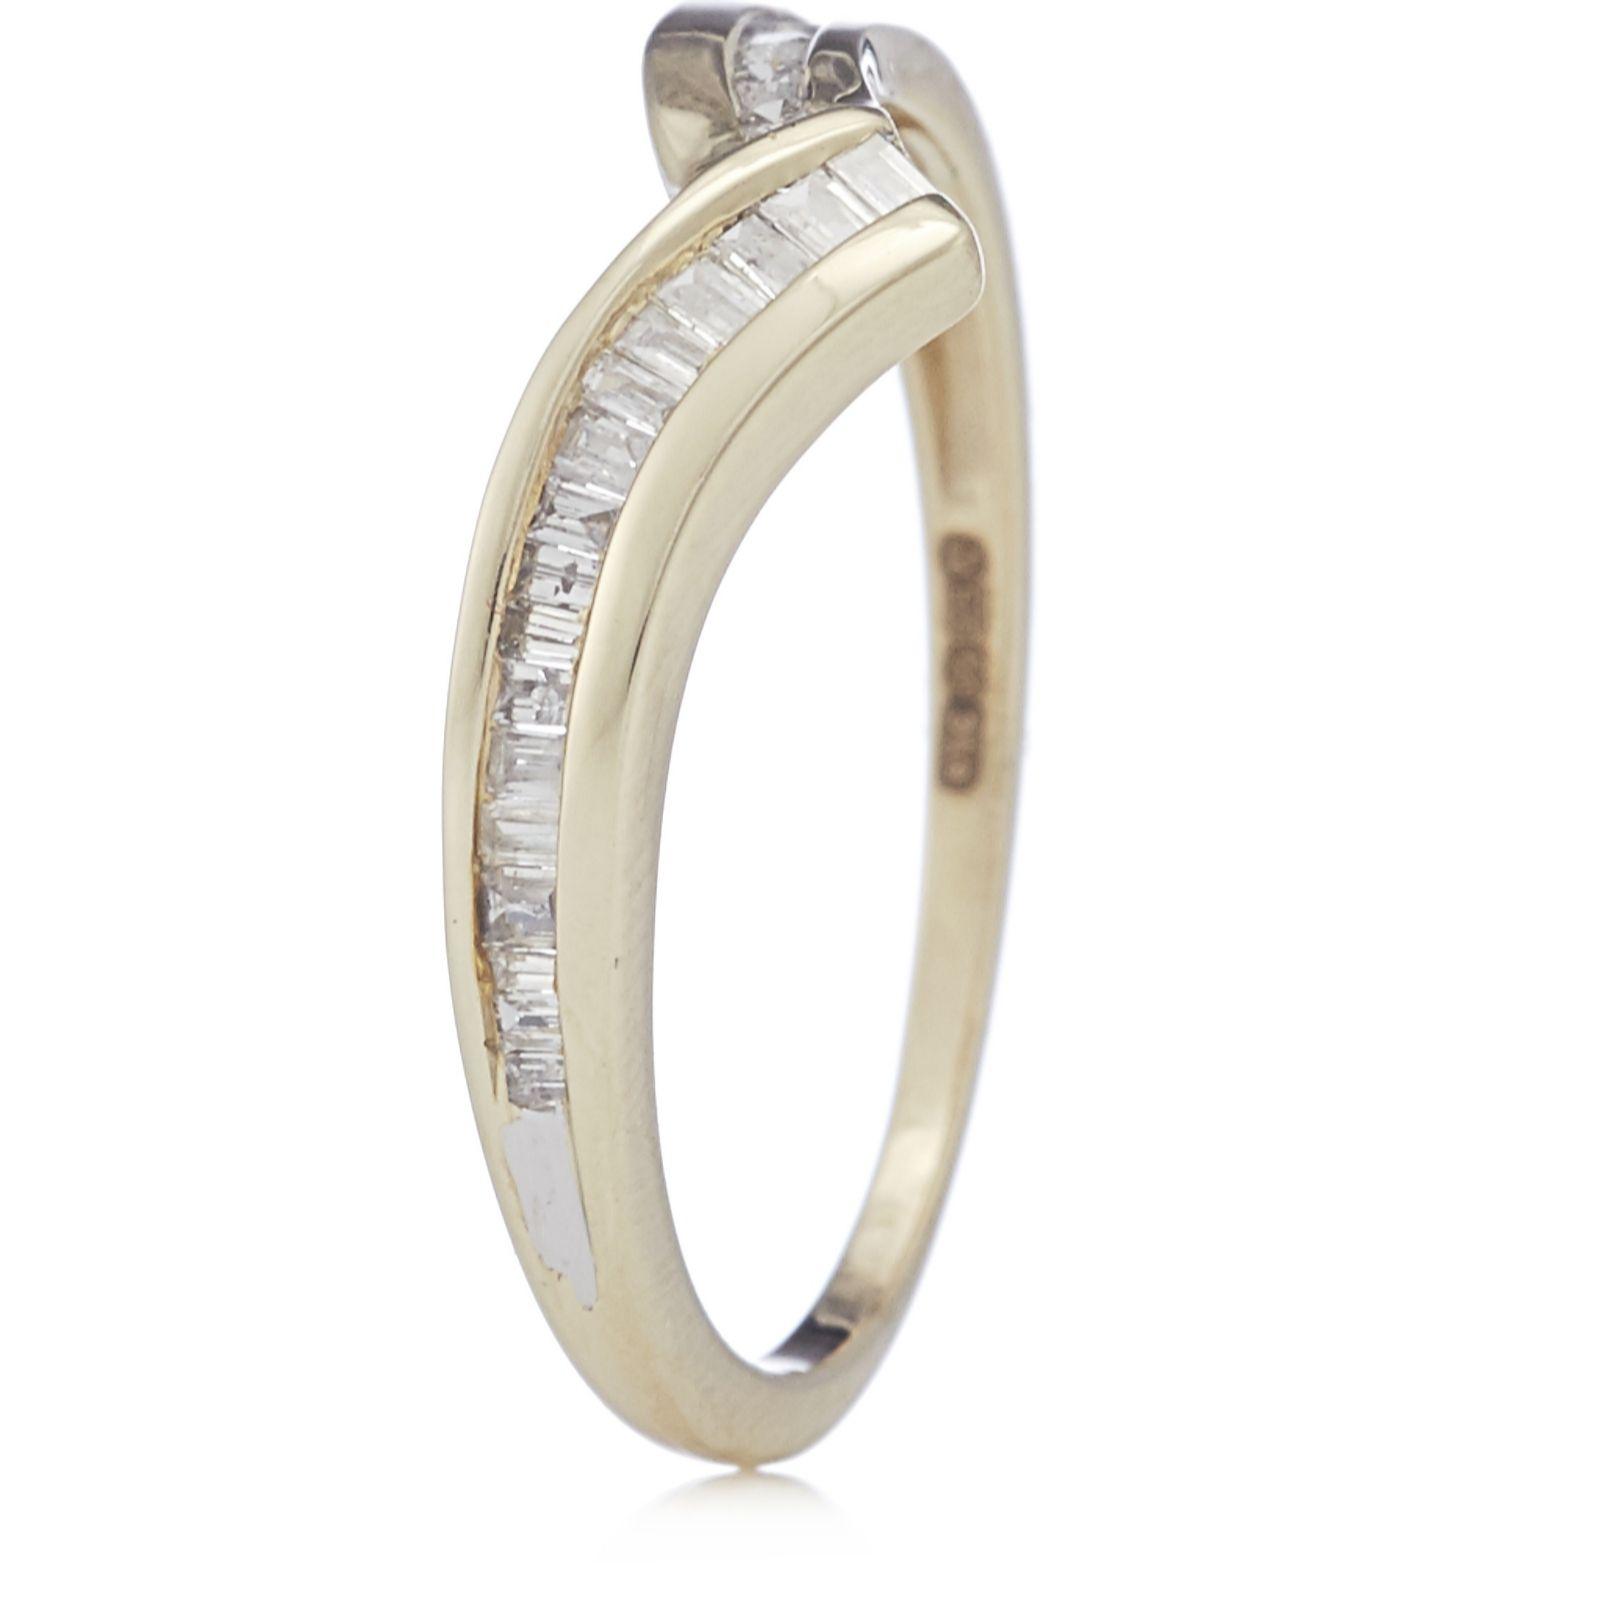 5ea159454f9bfc Outlet 0.20ct Diamond Mixed Cut Wishbone Ring 9ct Gold - QVC UK